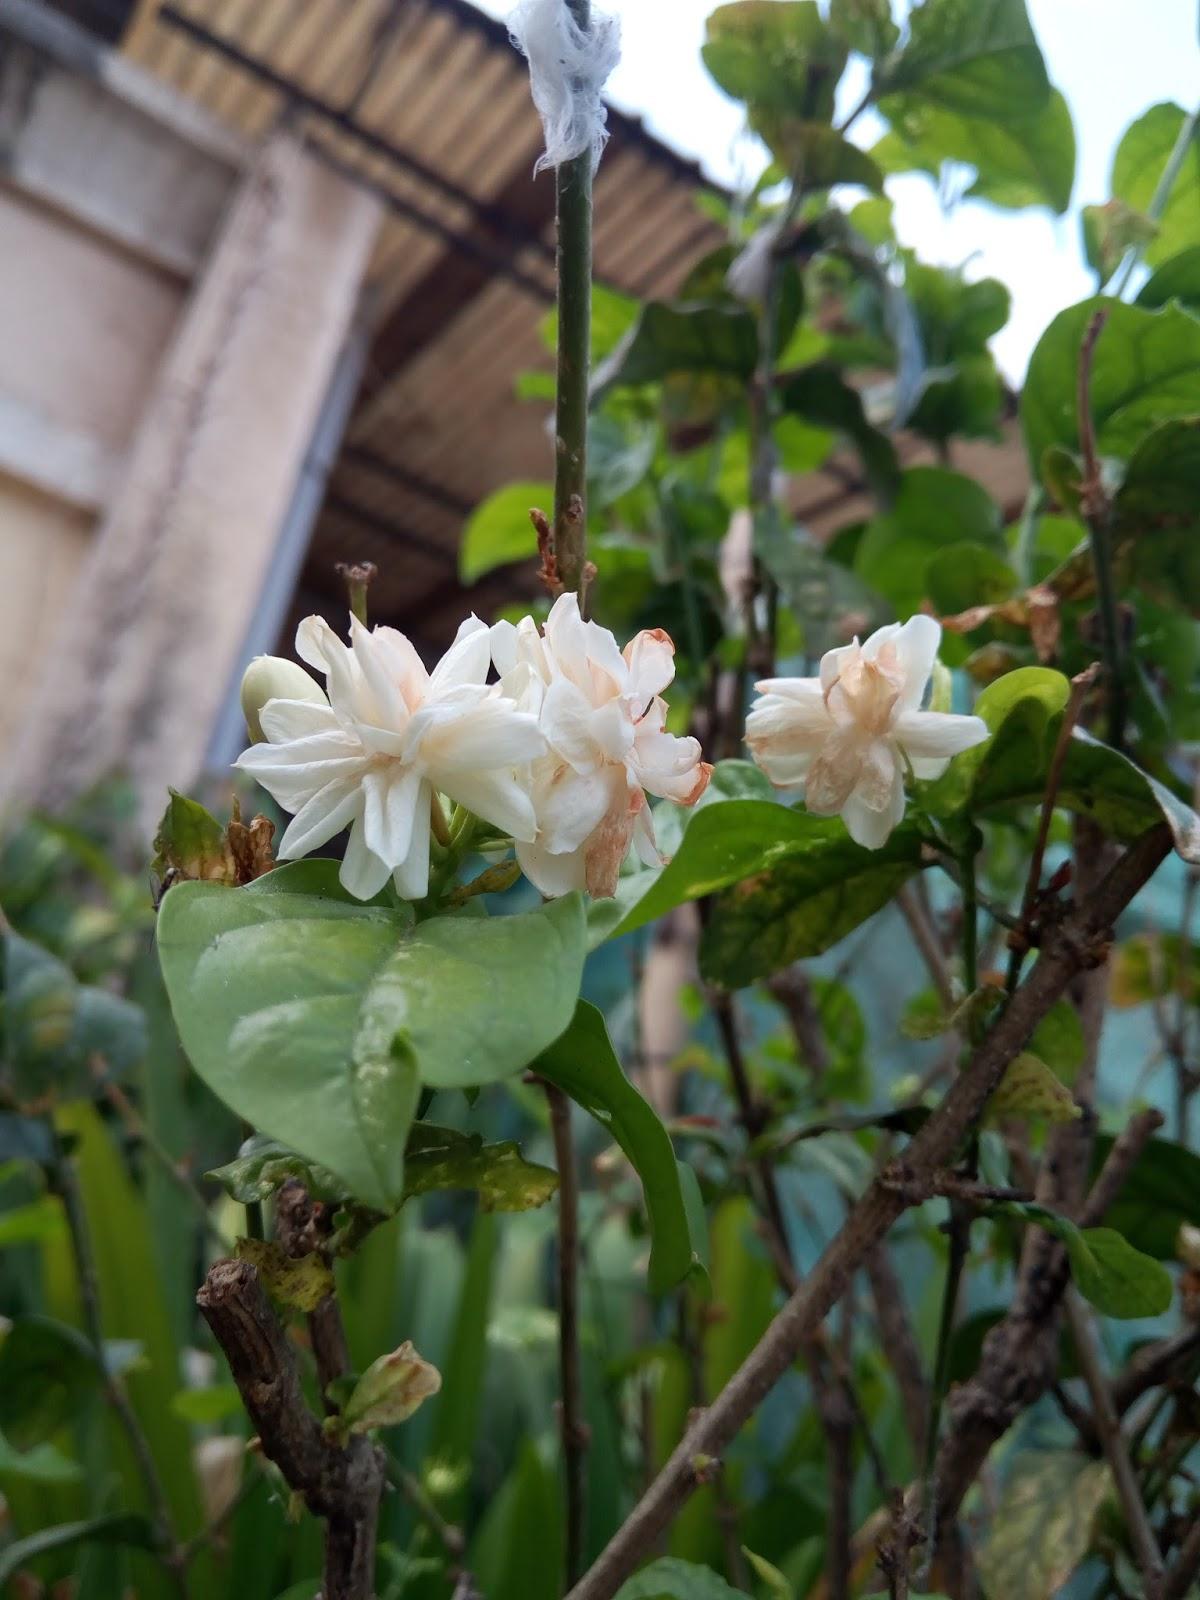 Garden Care Simplified: Mogra Flowering Plants Summer Care